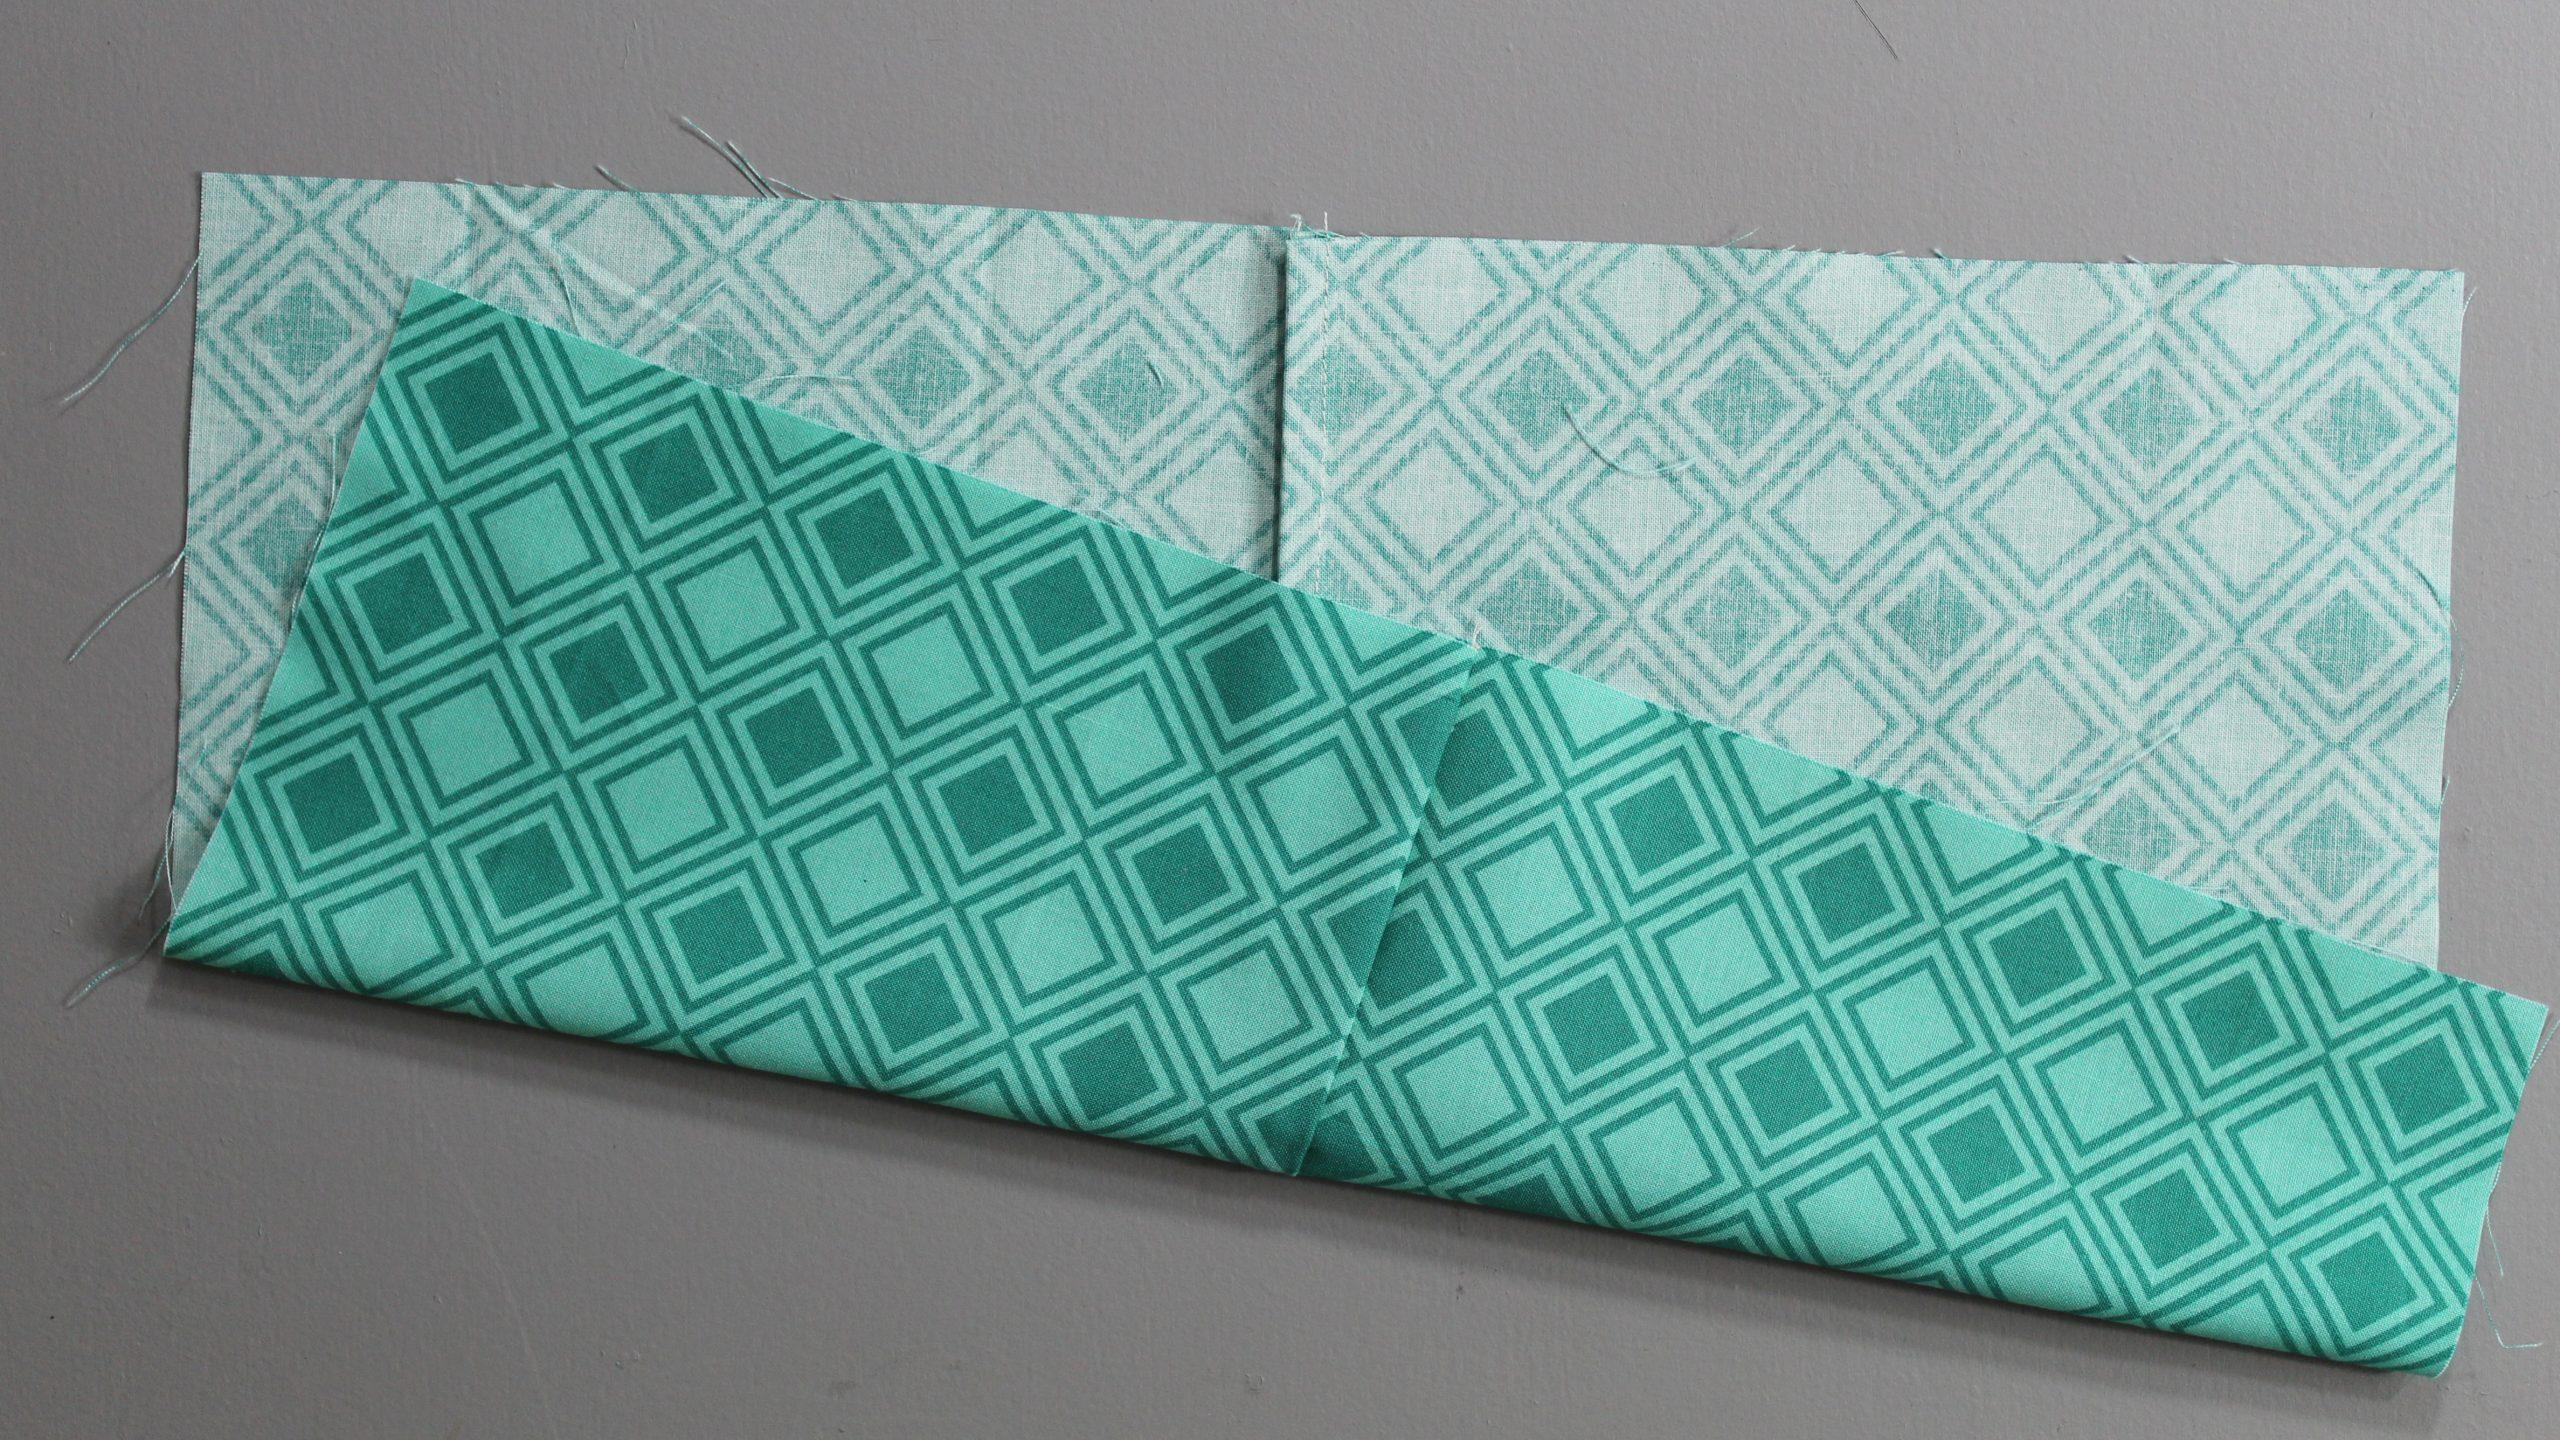 Fabric folded in half